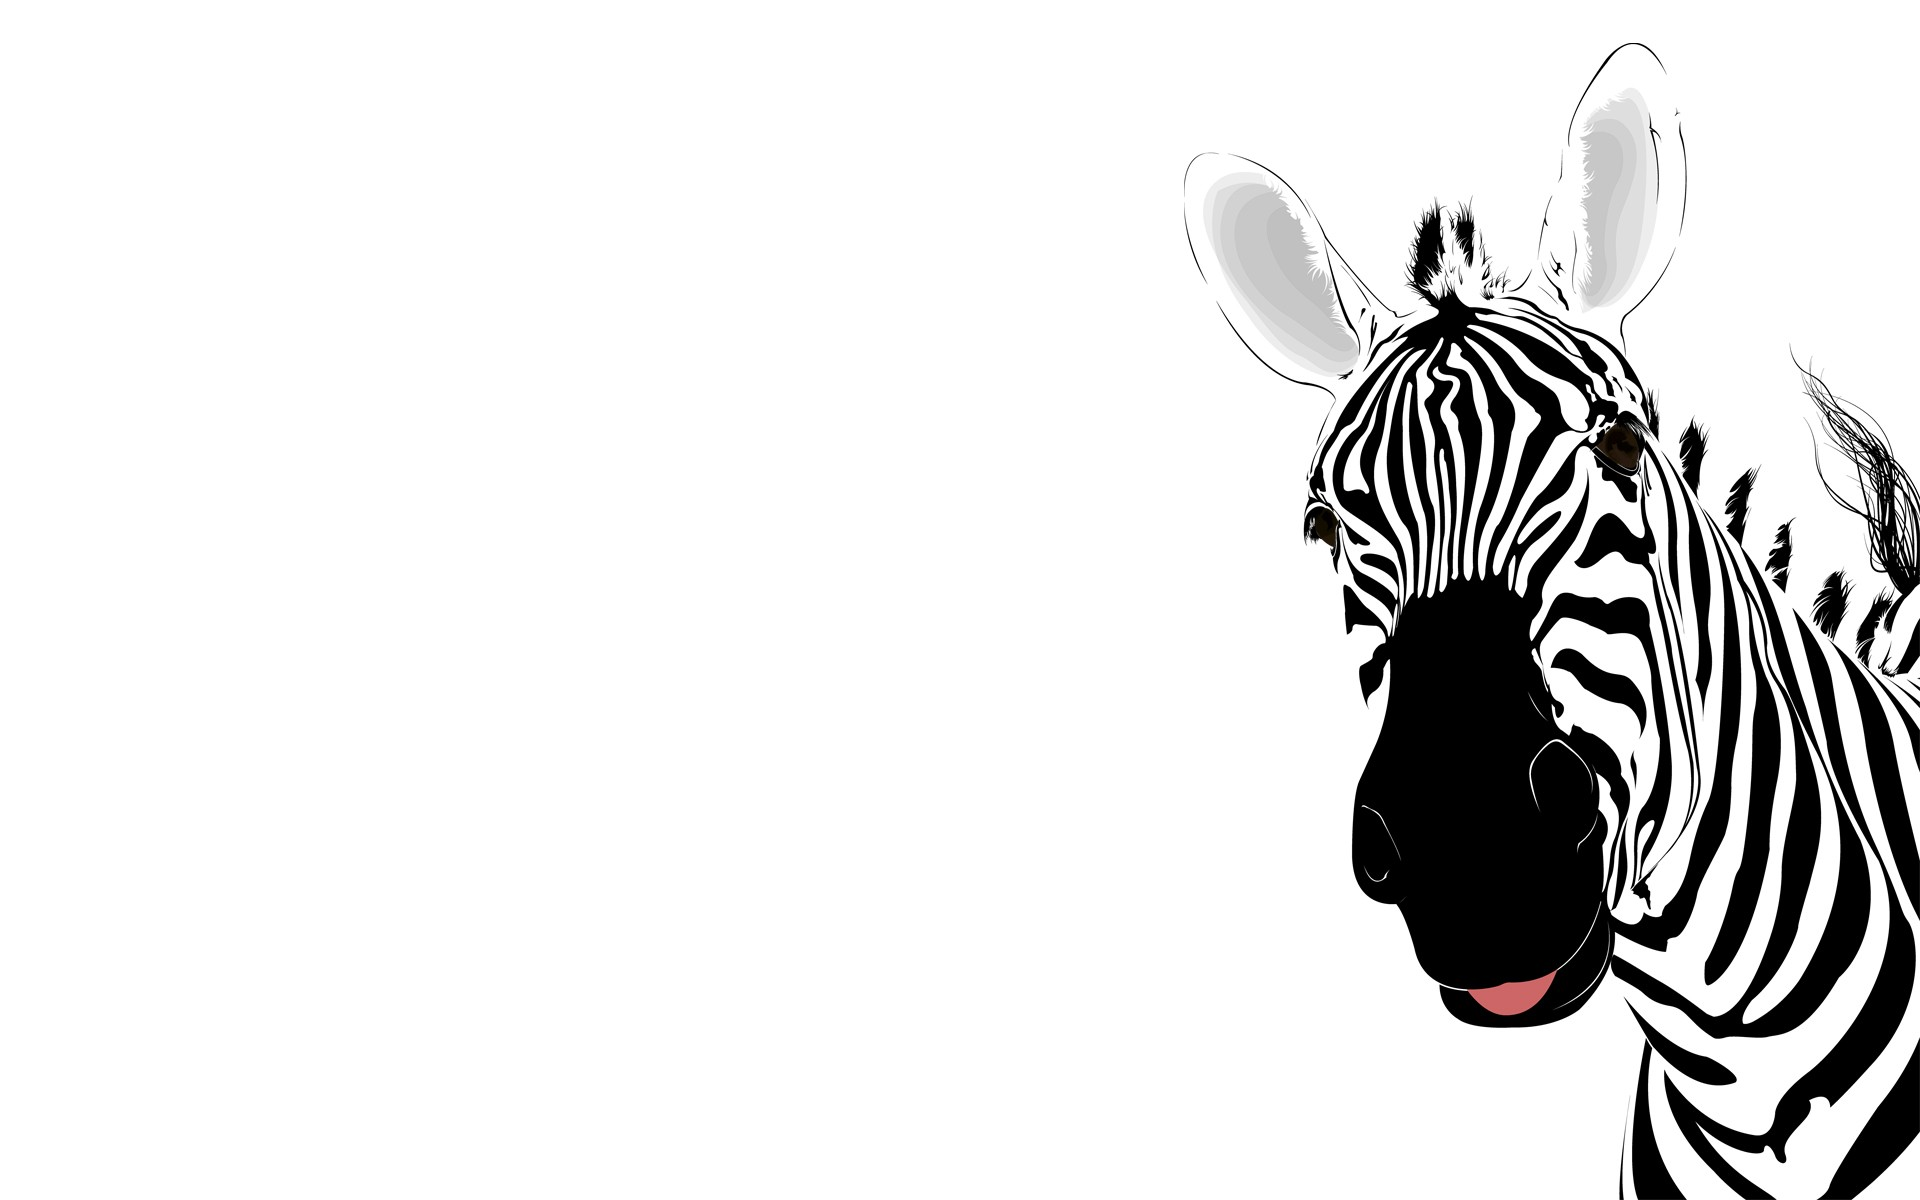 Zebra Print Heart Clip Art Zebra print backrounds - clipart best